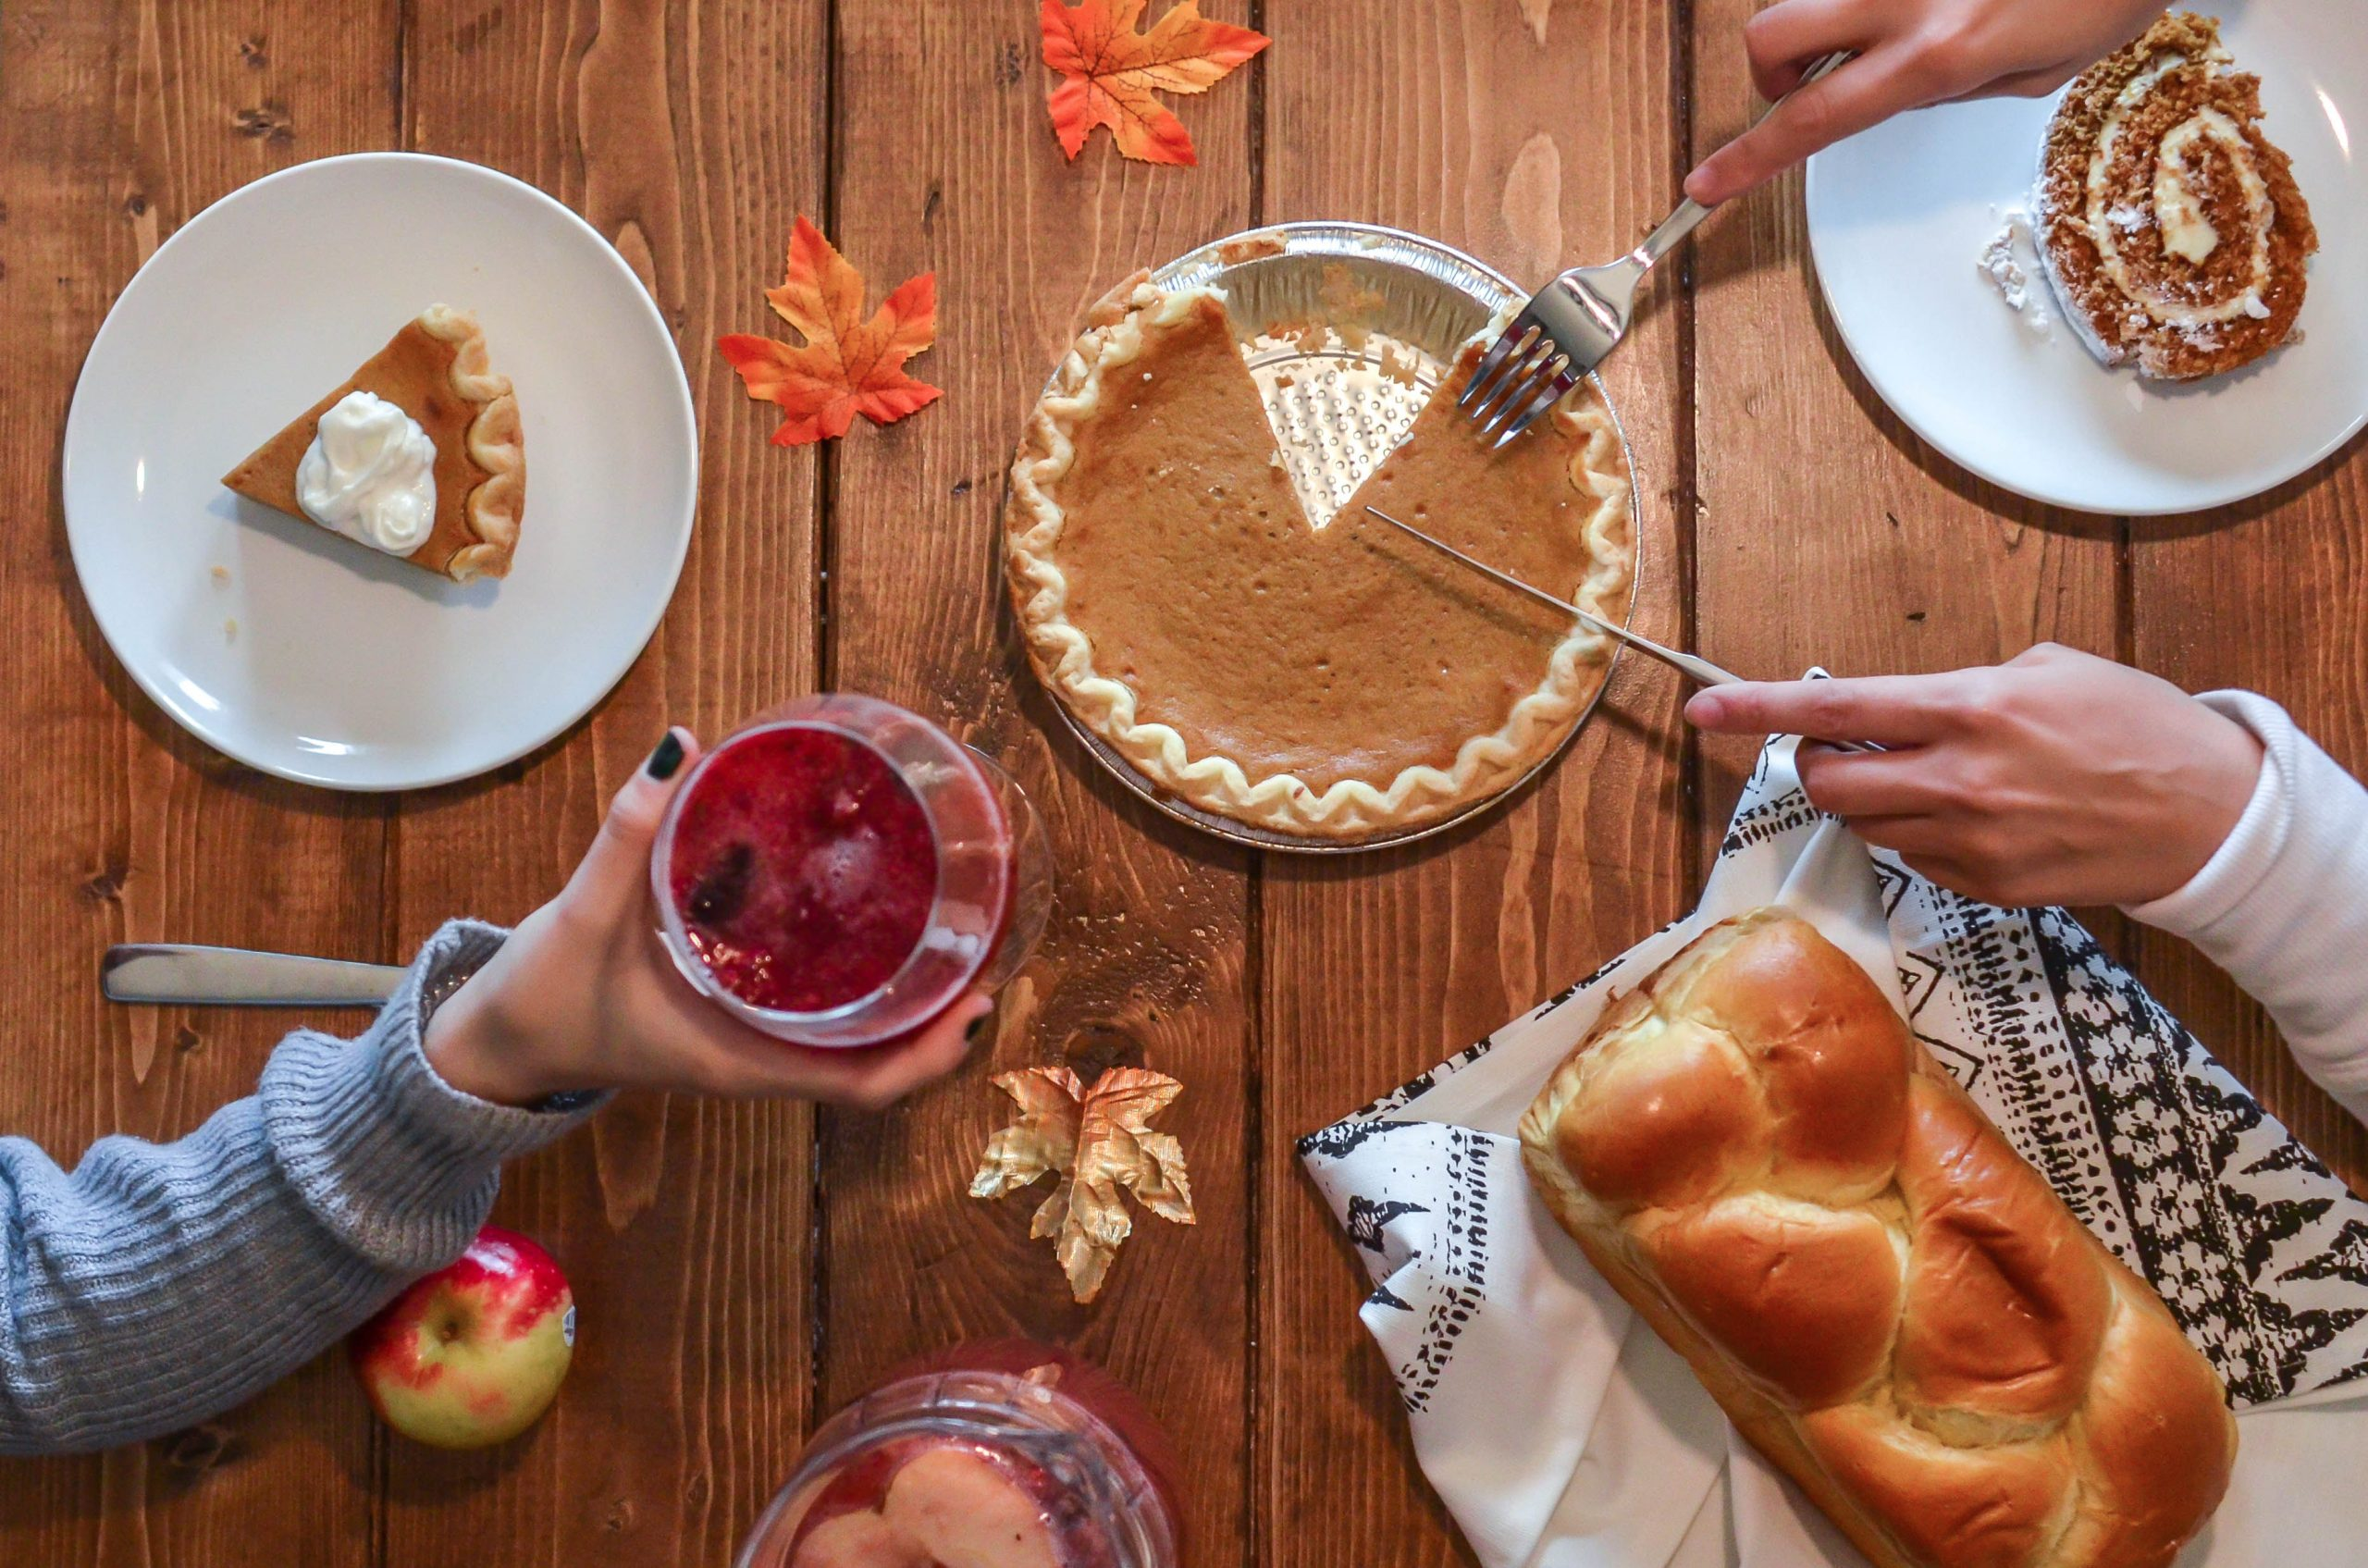 On Thanksgiving